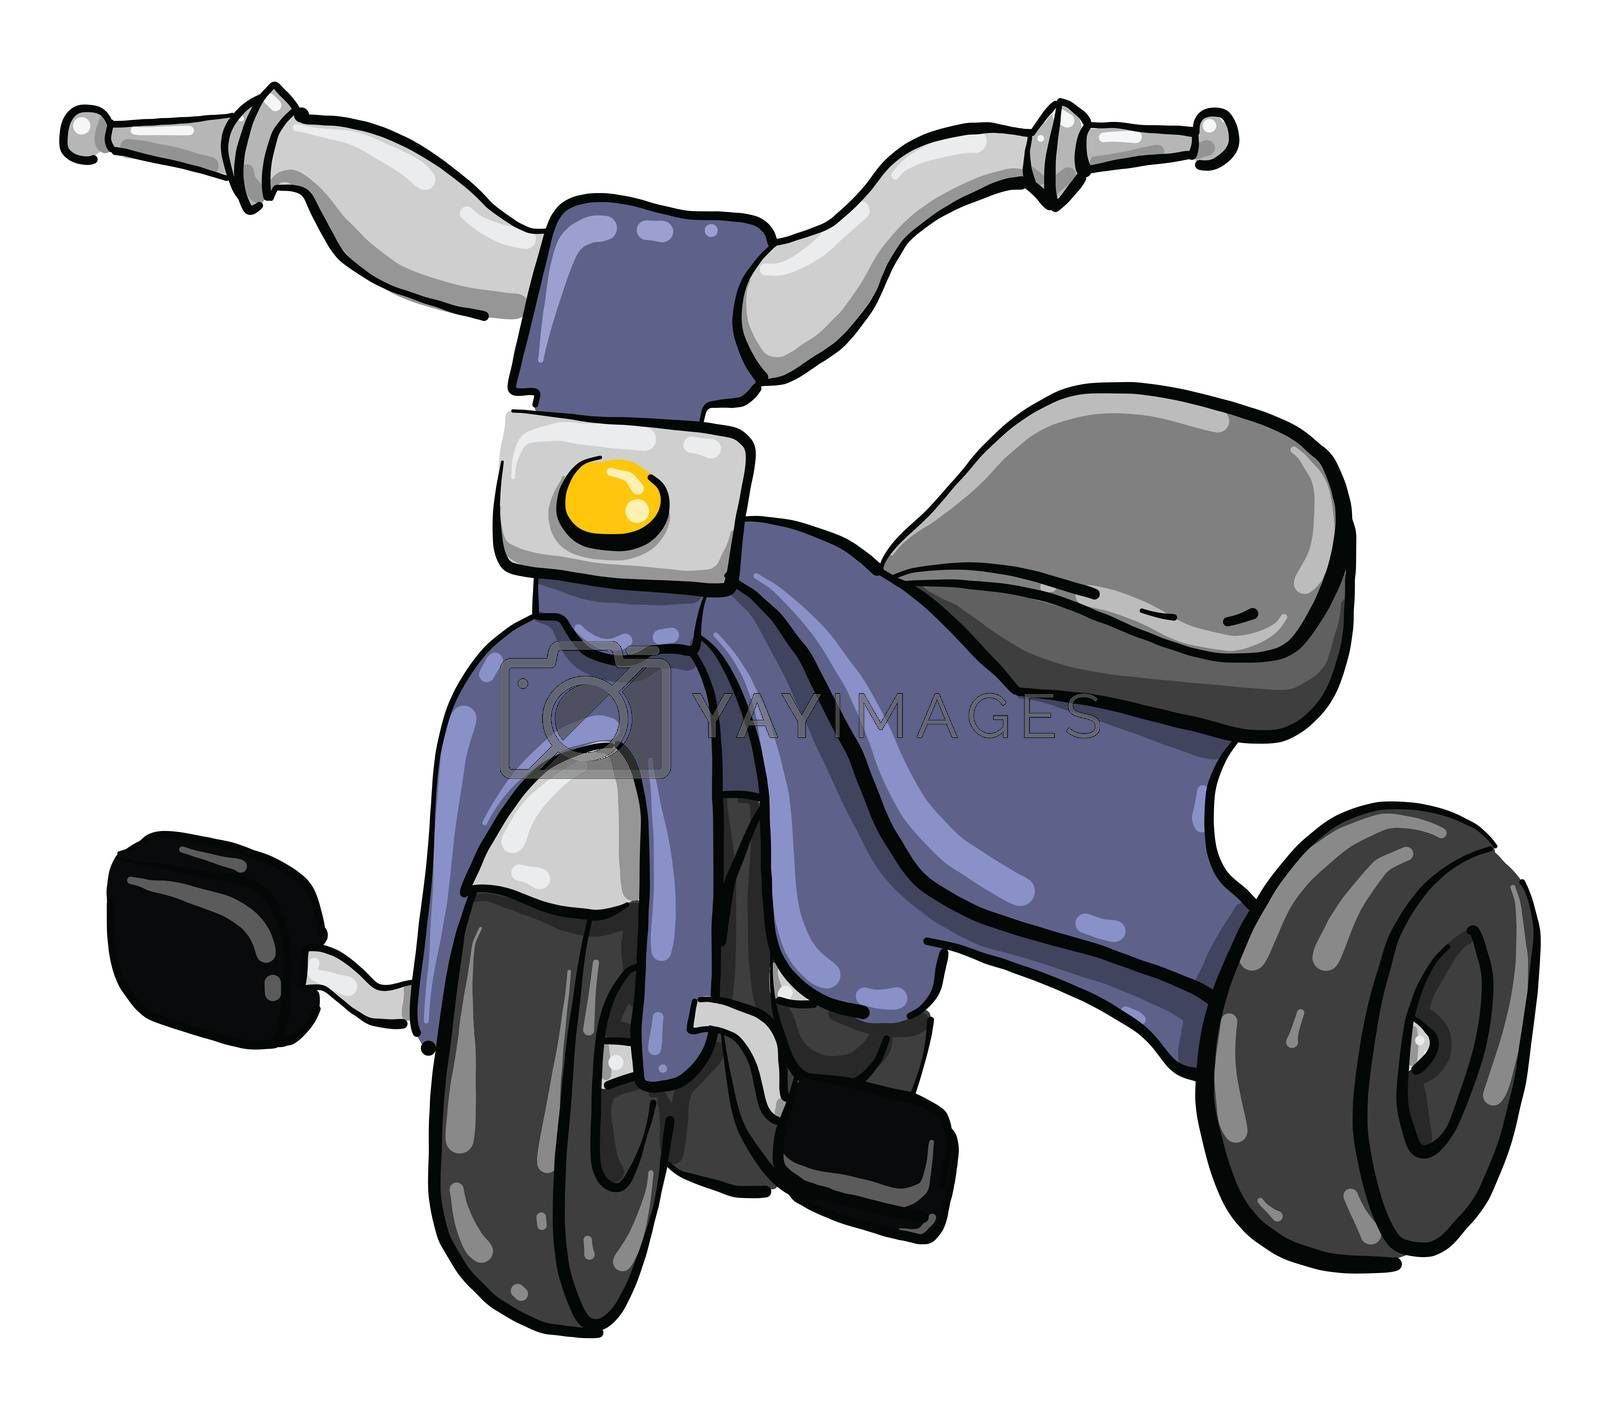 Small bike , illustration, vector on white background